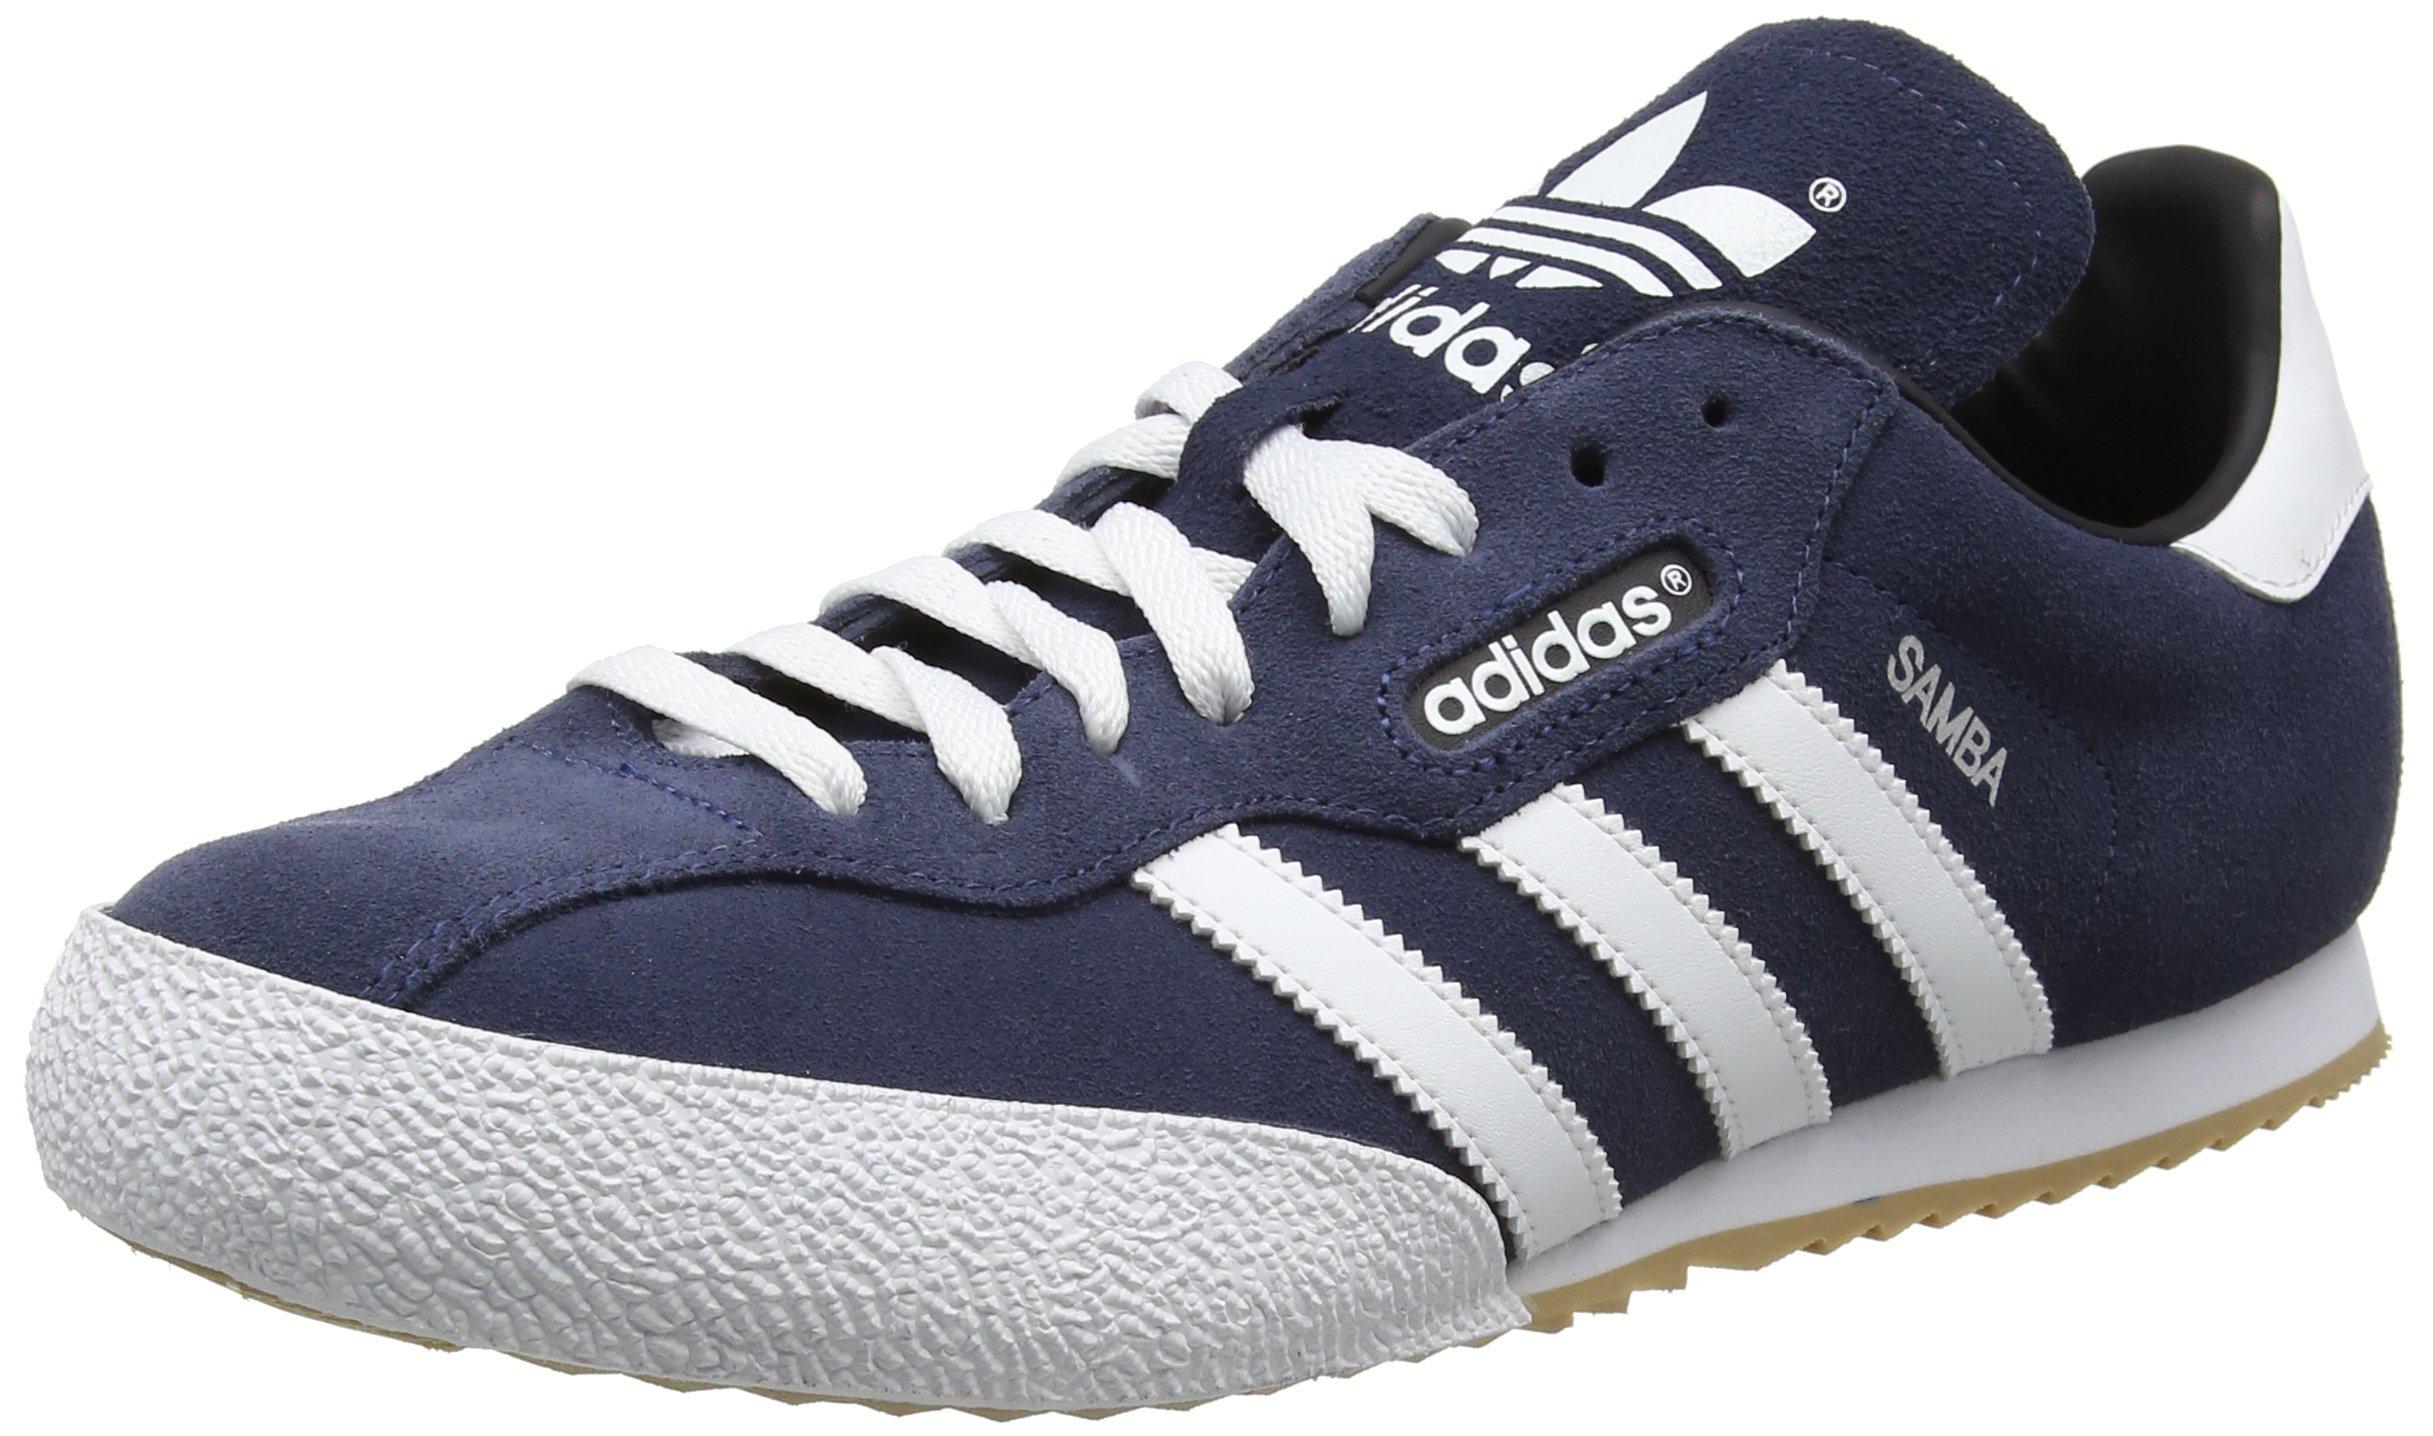 adidas clasic trainers